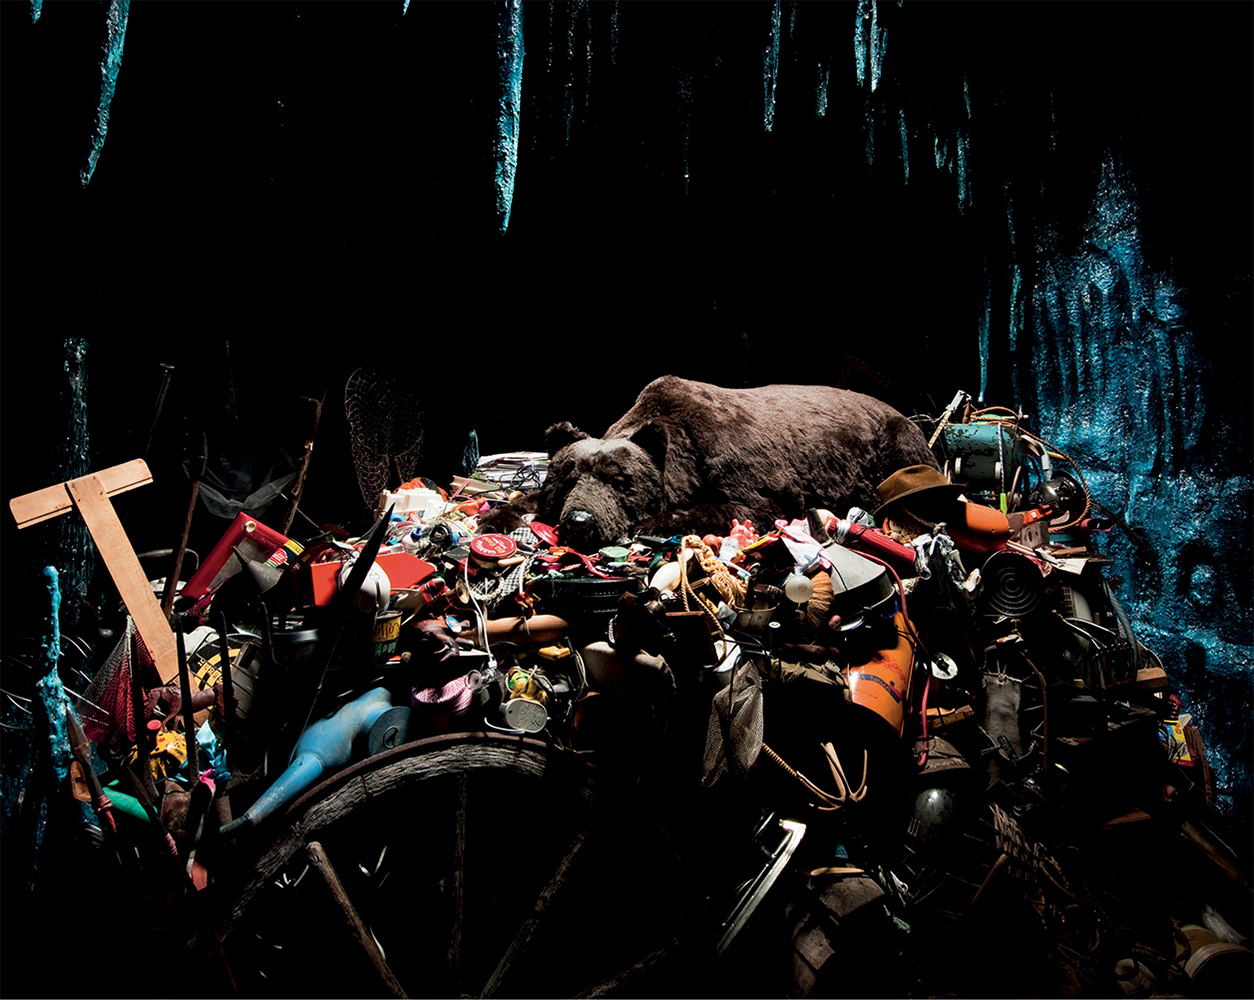 TROPICAL RAINFOREST PRESERVES  (Mobile VERSION) 1990  Mark Dion and William Schefferine, tropical vegetation, soil, stones, and enamel wheelbarrow. Courtesy of the artist and Tanya Bonakdar Gallery, New York.